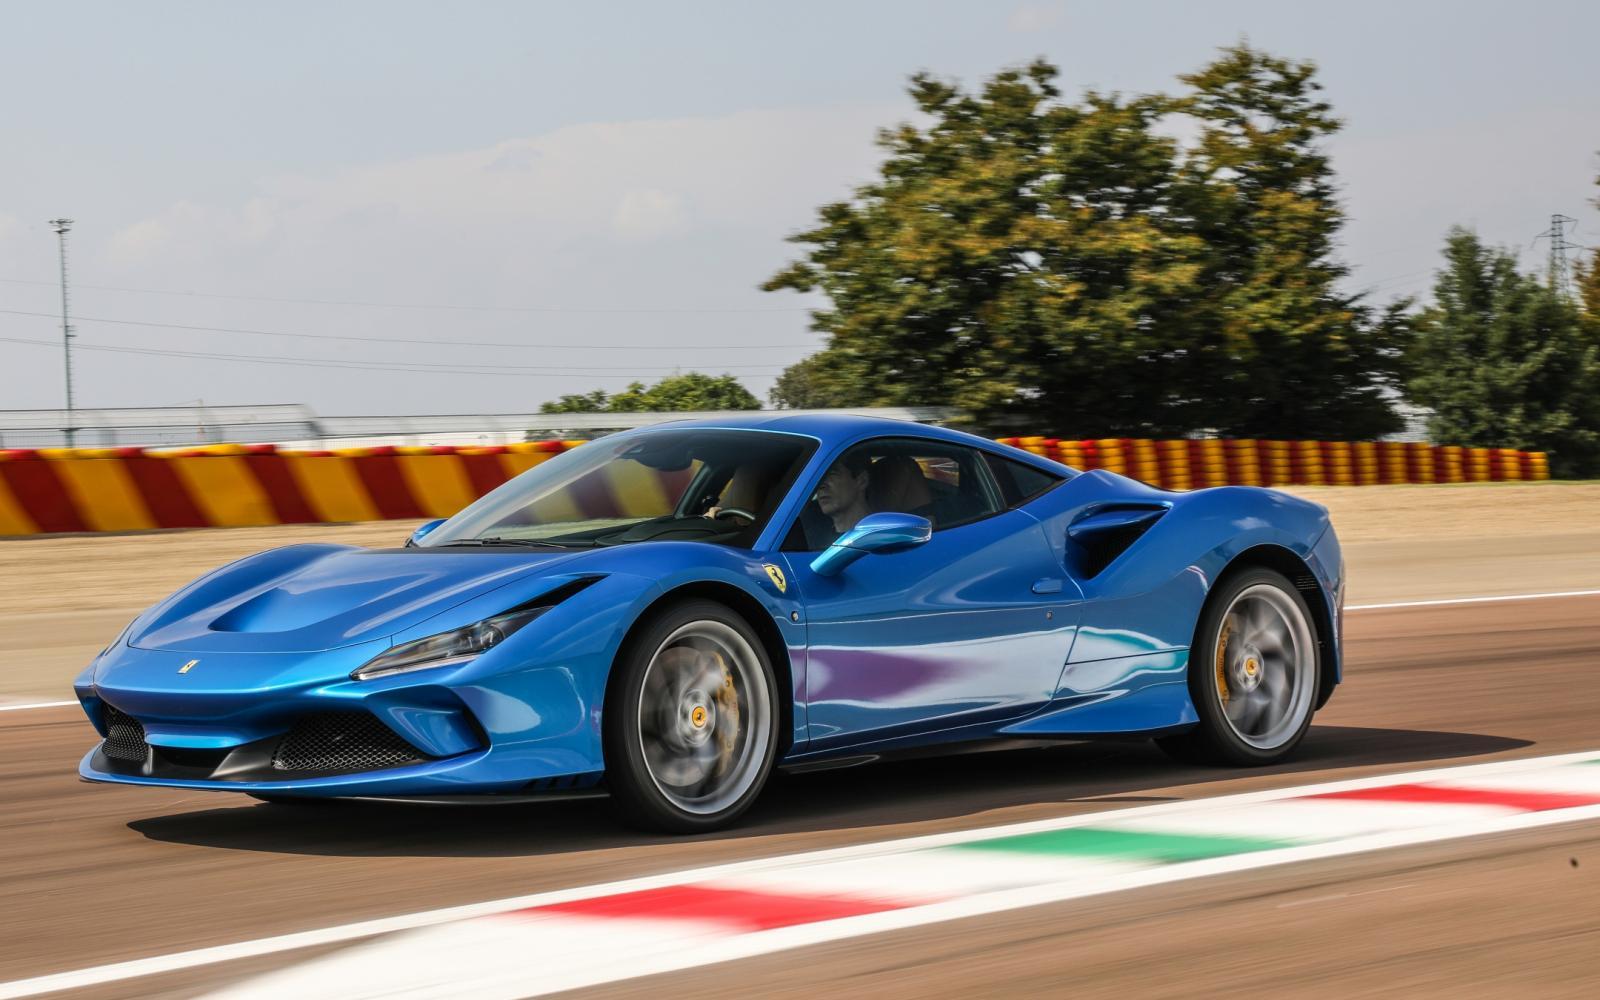 Prijslijst Ferrari F8 Tributo begint boven de drie ton